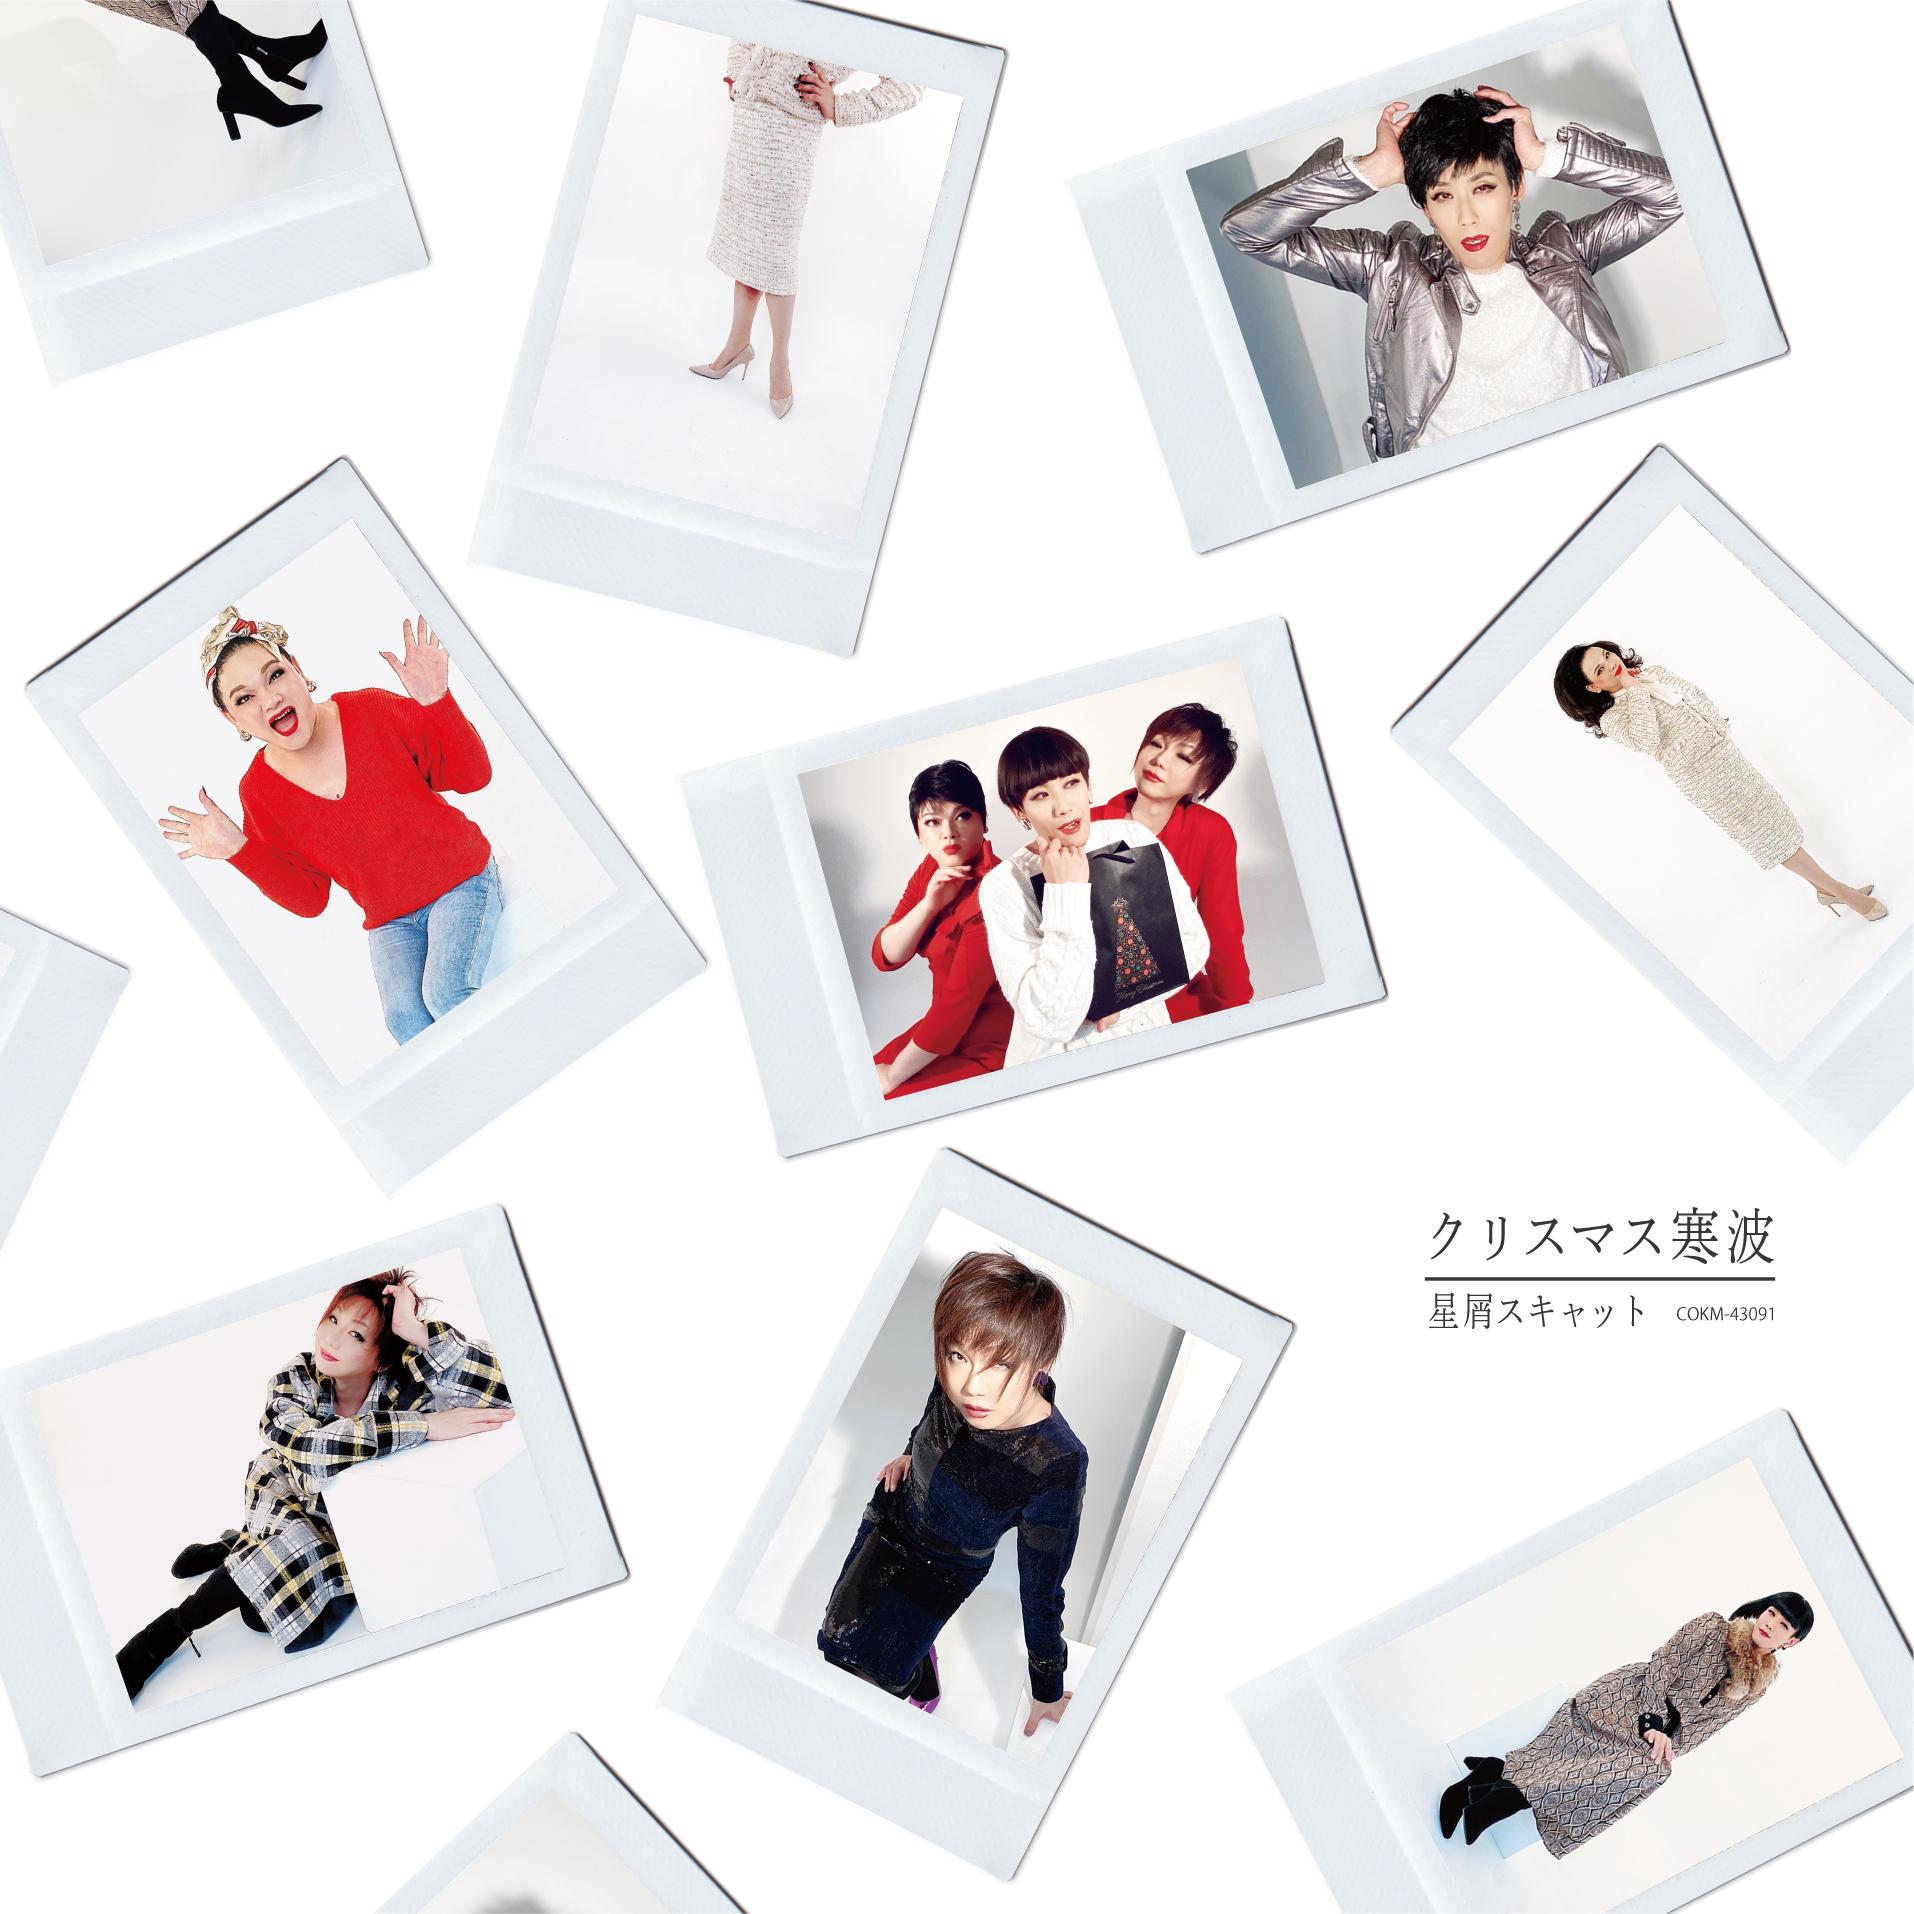 【NEW RELEASE】配信シングル『クリスマス寒波』12月10日リリース決定!